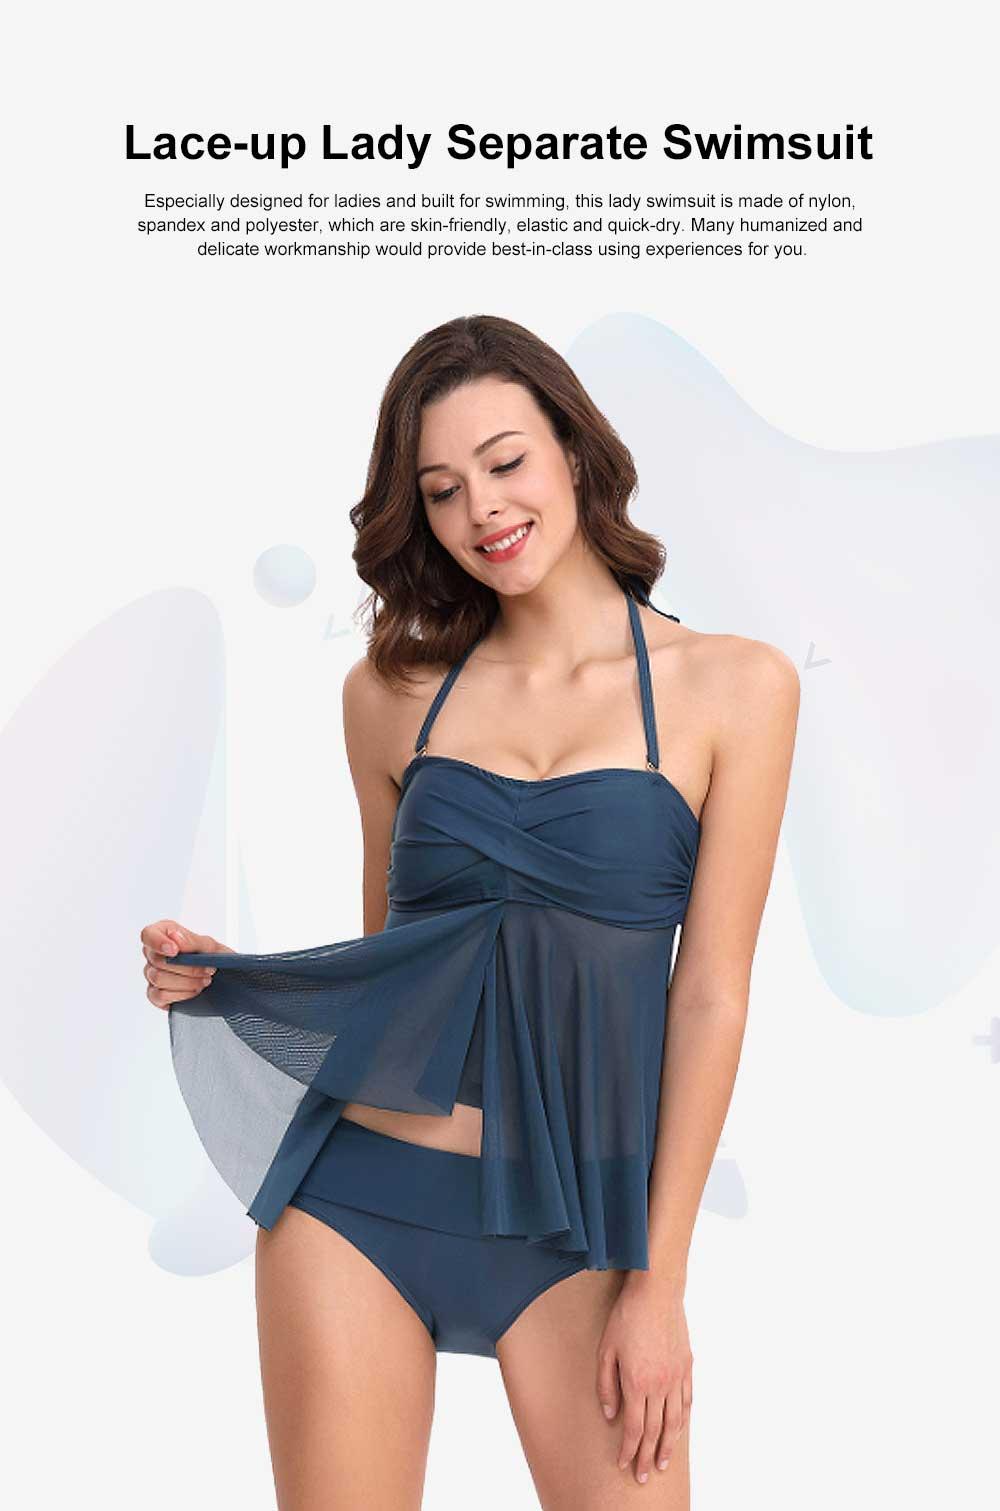 Minimalist Fancy Lace-up Ladies Separates Swimsuit, Elastic Skin-friendly Nylon Spandex Beachwear Bikini Swimwear 0